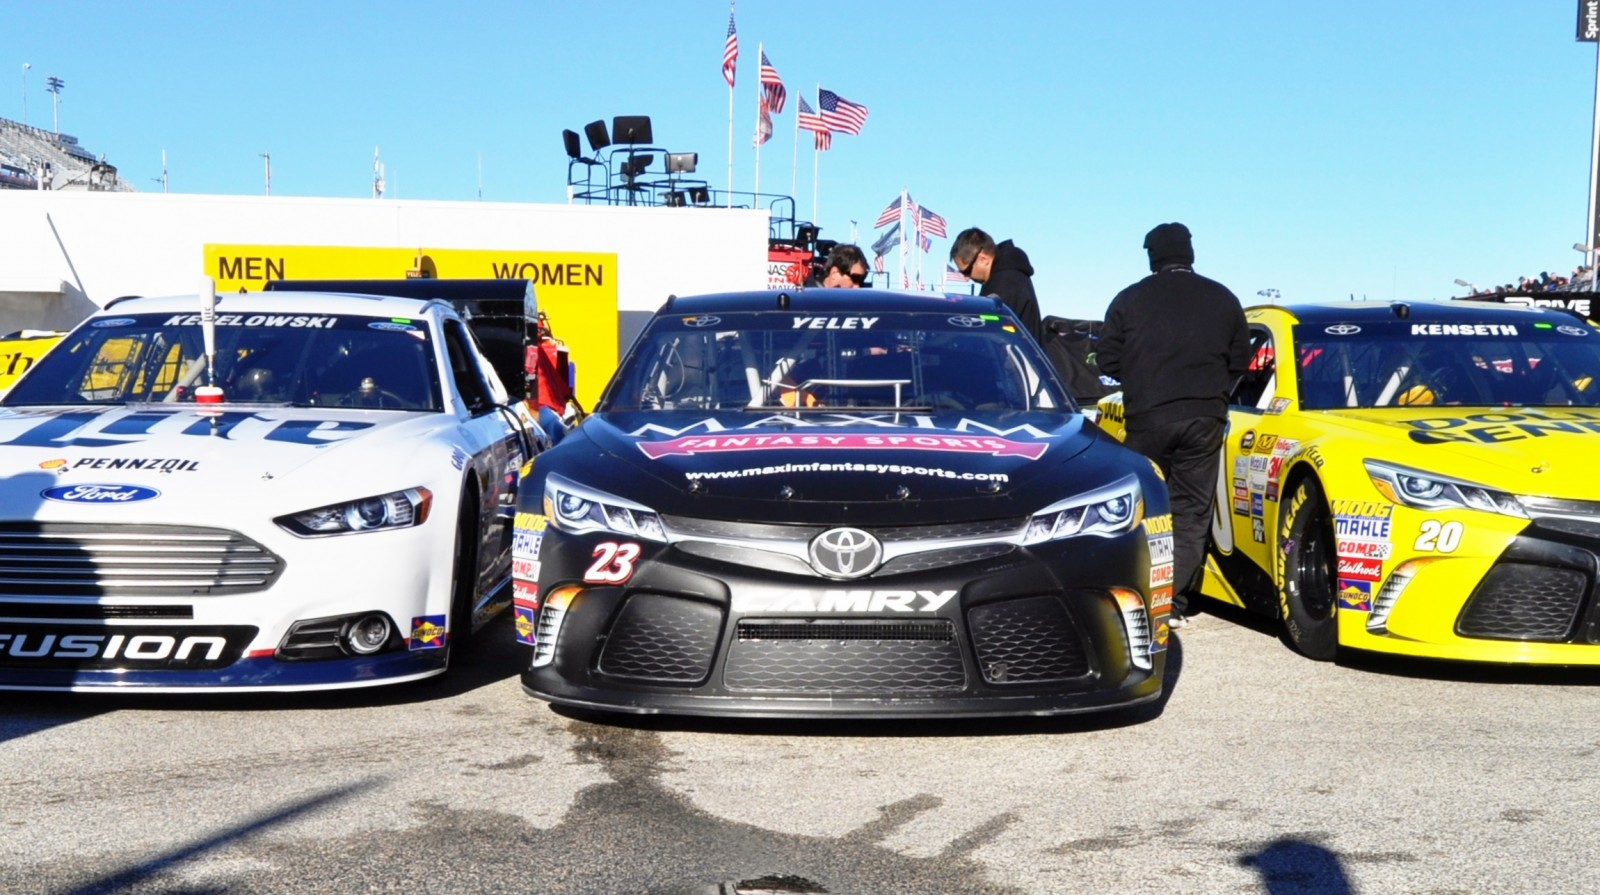 2015 Toyota Camry NASCAR Dollar General 62